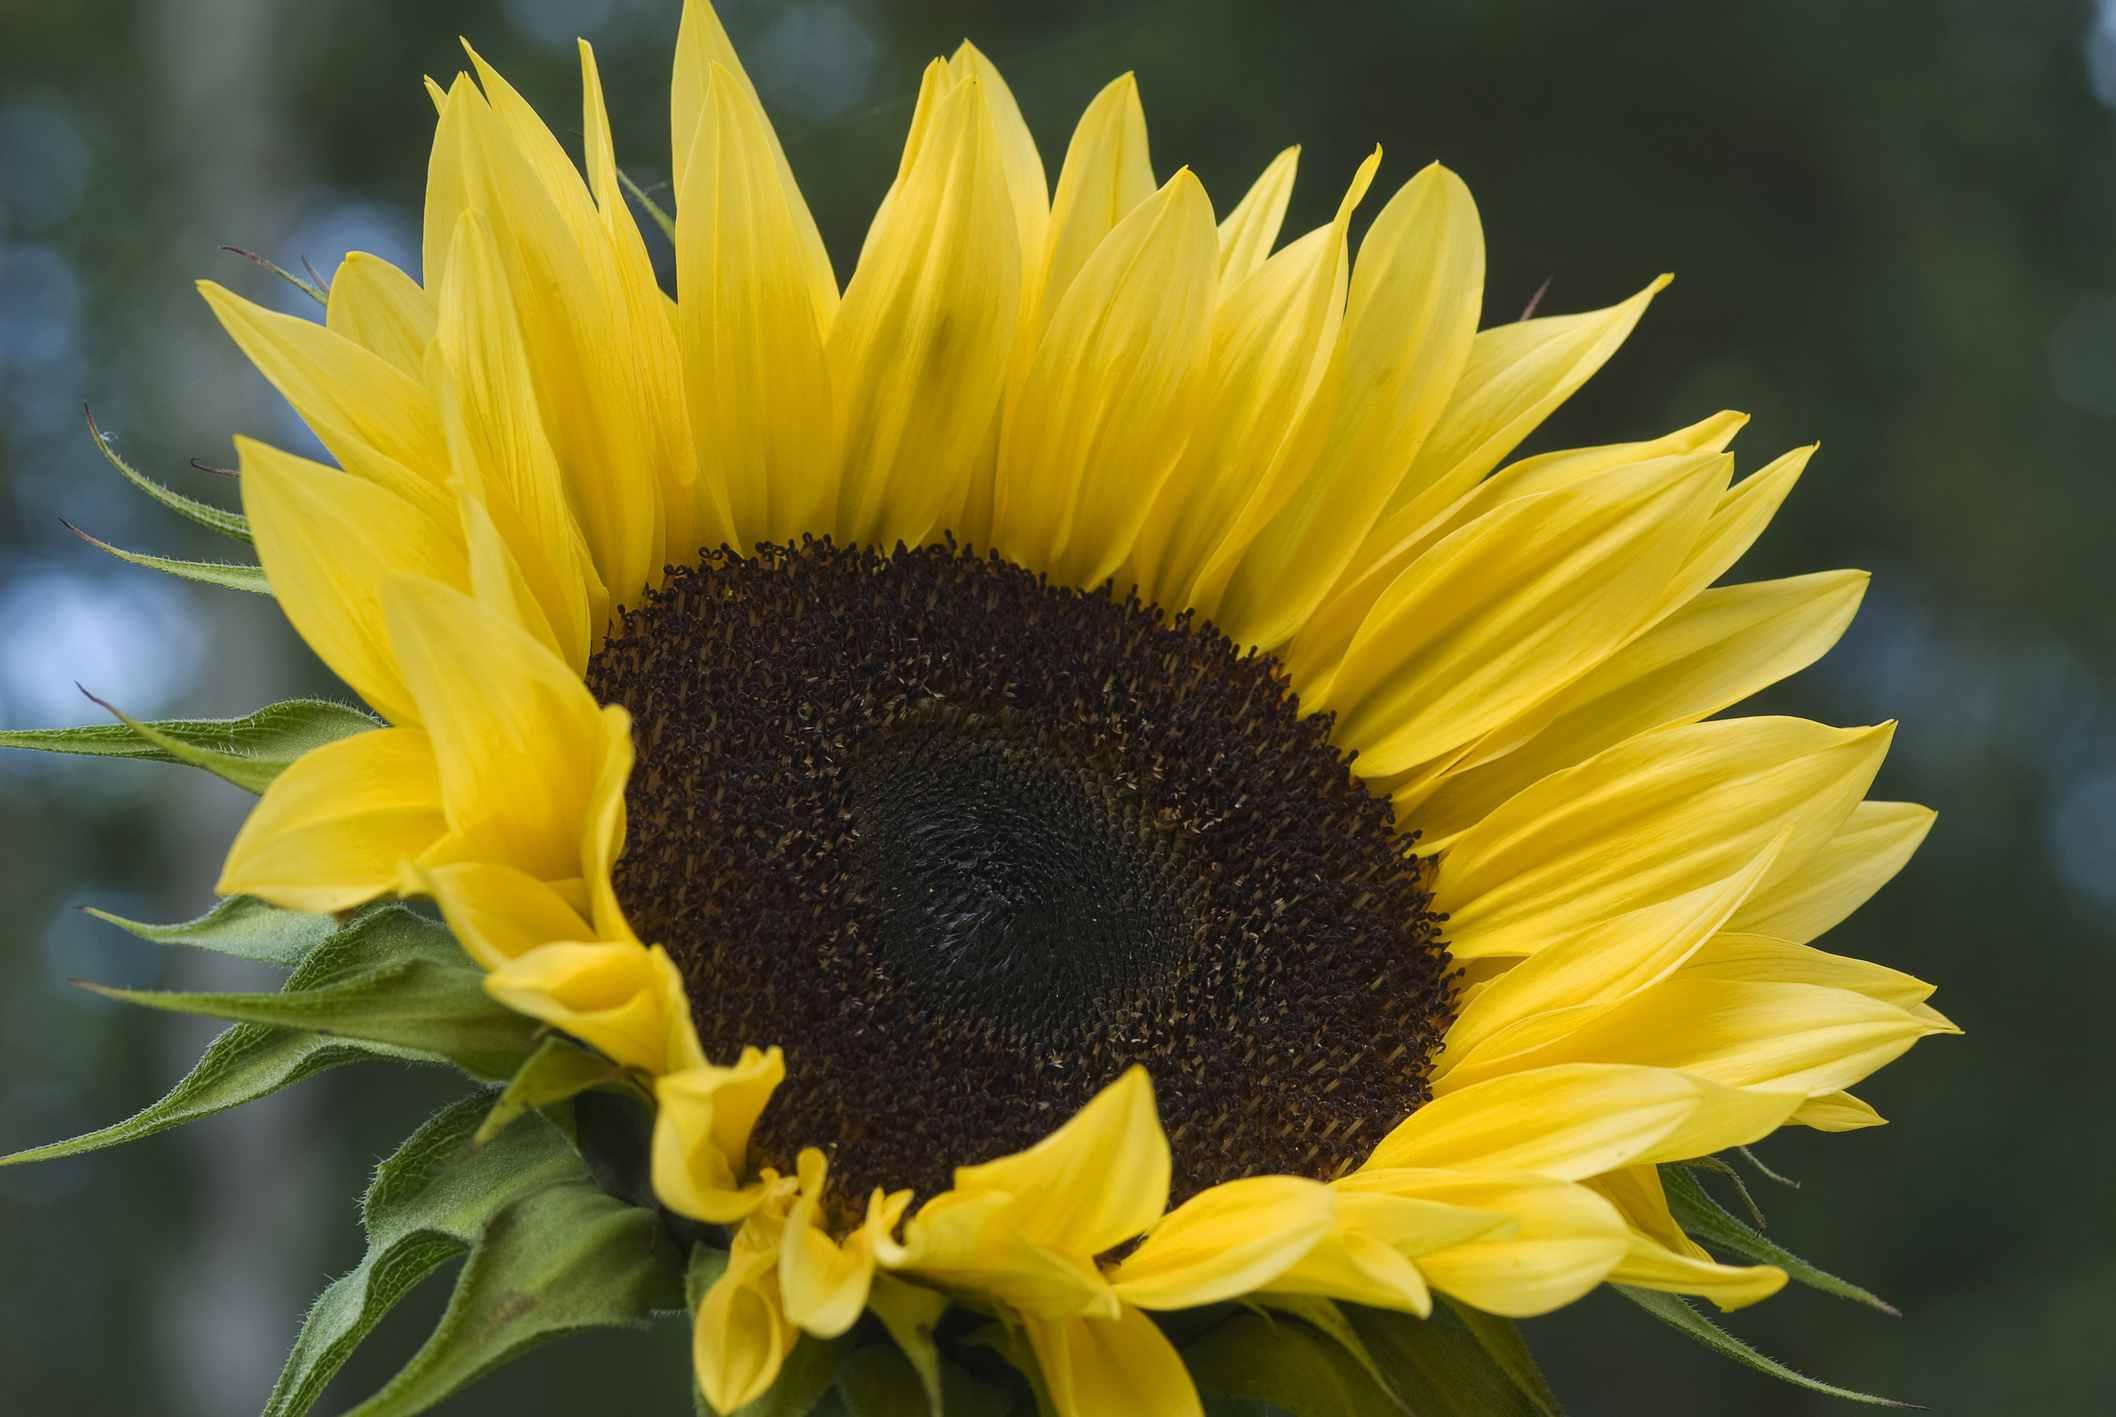 Pro Cut Peach Sunflower